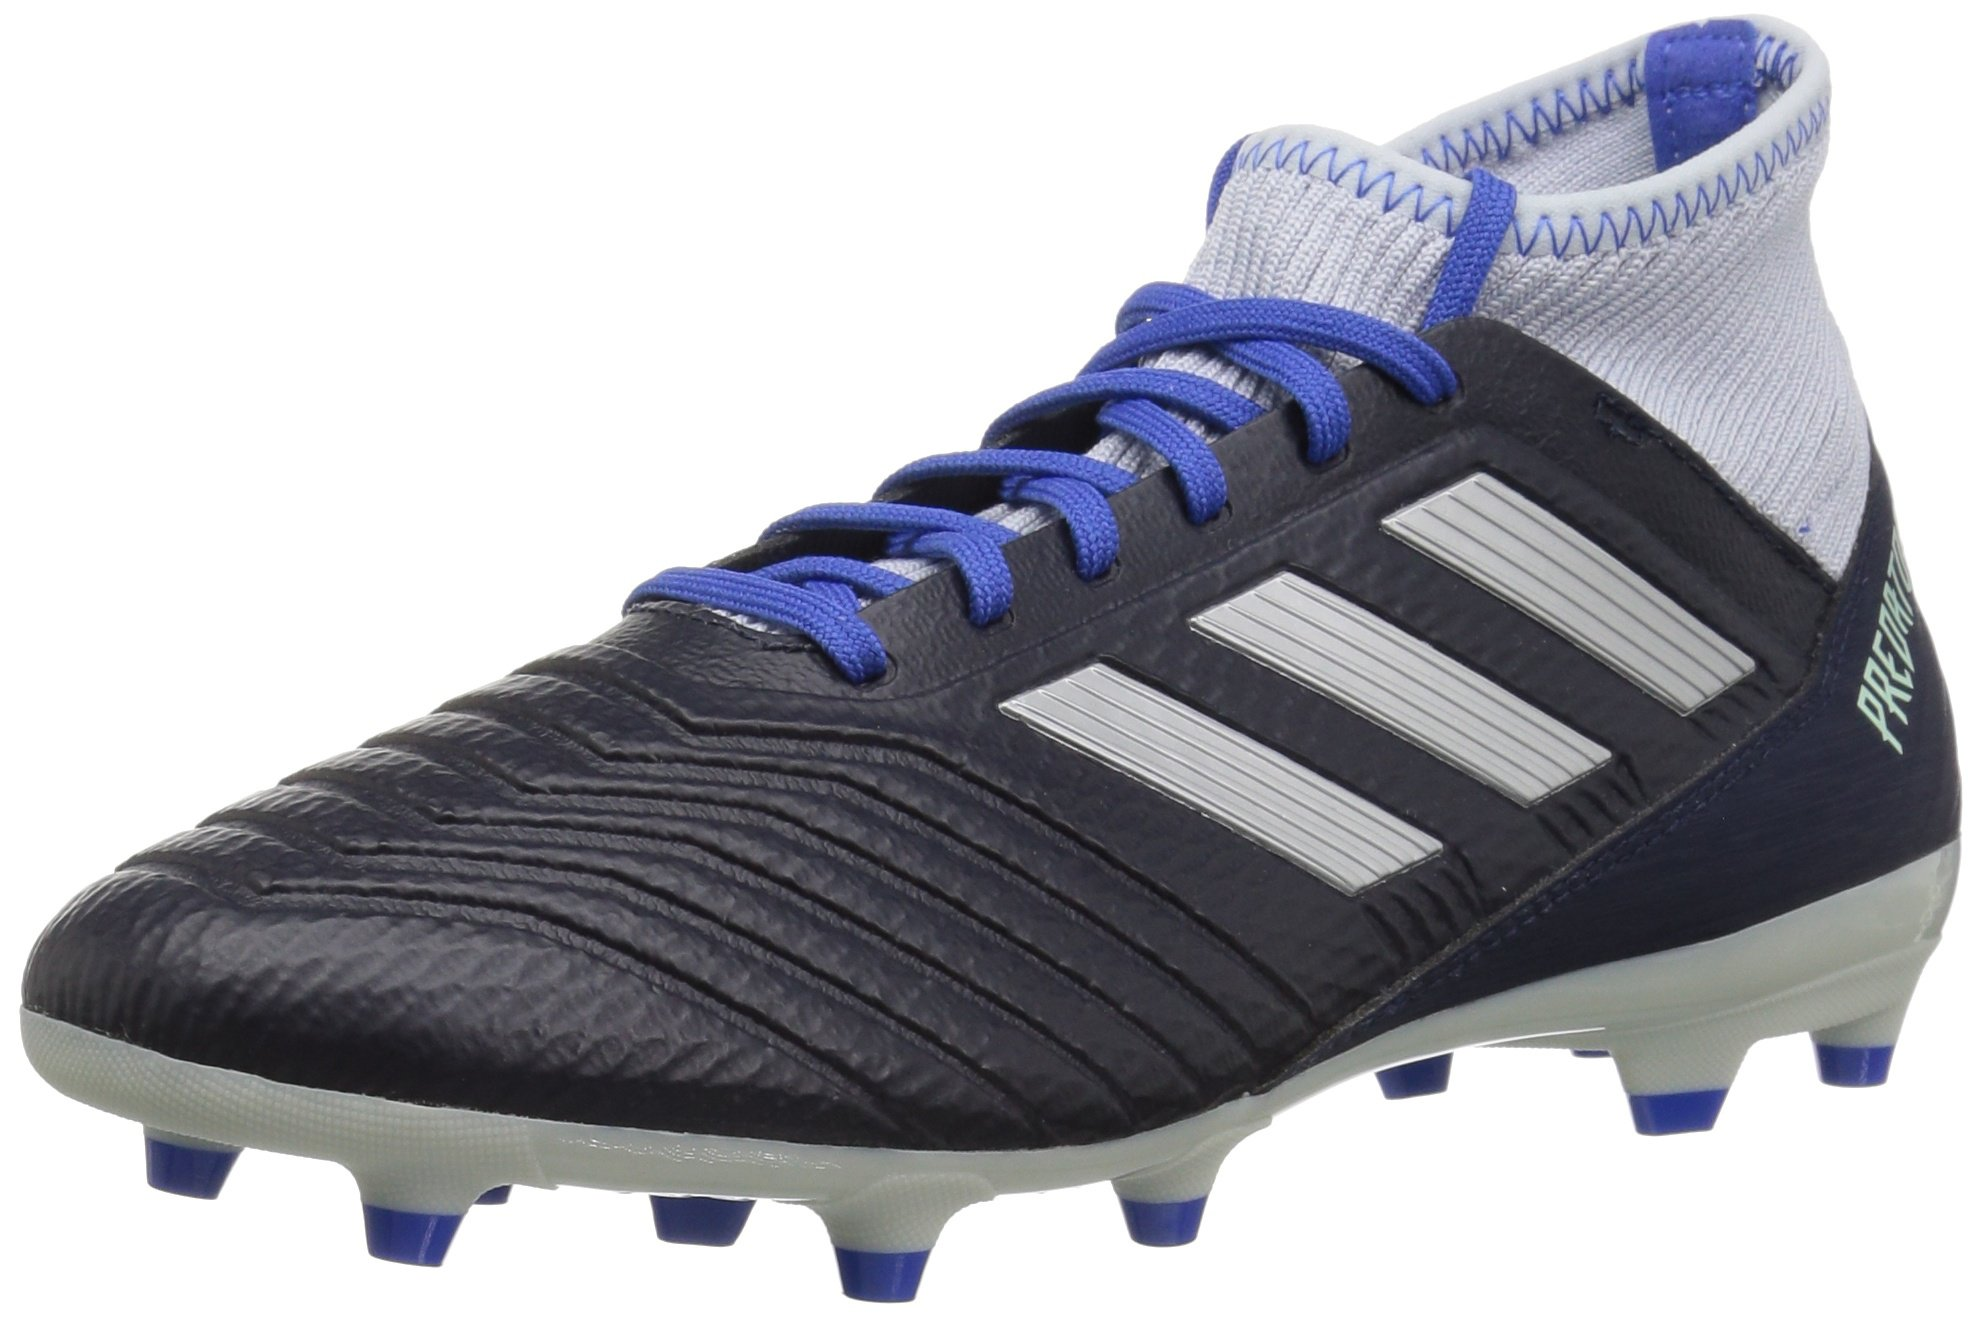 adidas Women's Predator 18.3 Firm Ground Soccer Shoe, Legend Ink/Silver Metallic/aero Blue, 10.5 M US